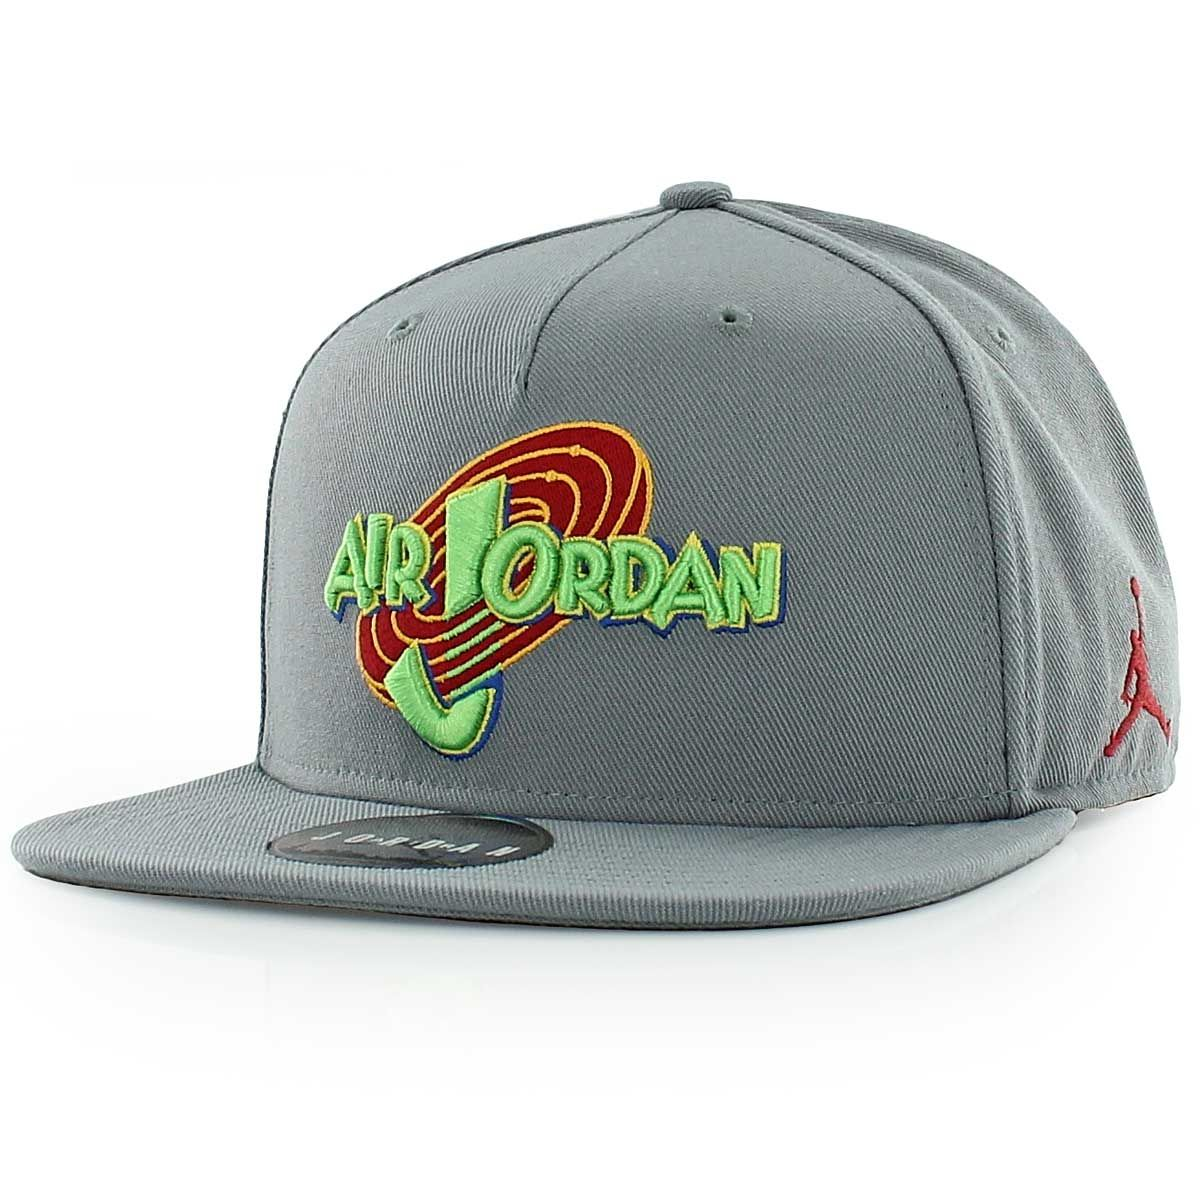 fb82cd9eaf9dcb Boxing 1227  Ggg Gennady Golovkin Jumpan Air Jordan Hat Sold Out Canelo Big  Drama Show -  BUY IT NOW ONLY   120 on eBay!